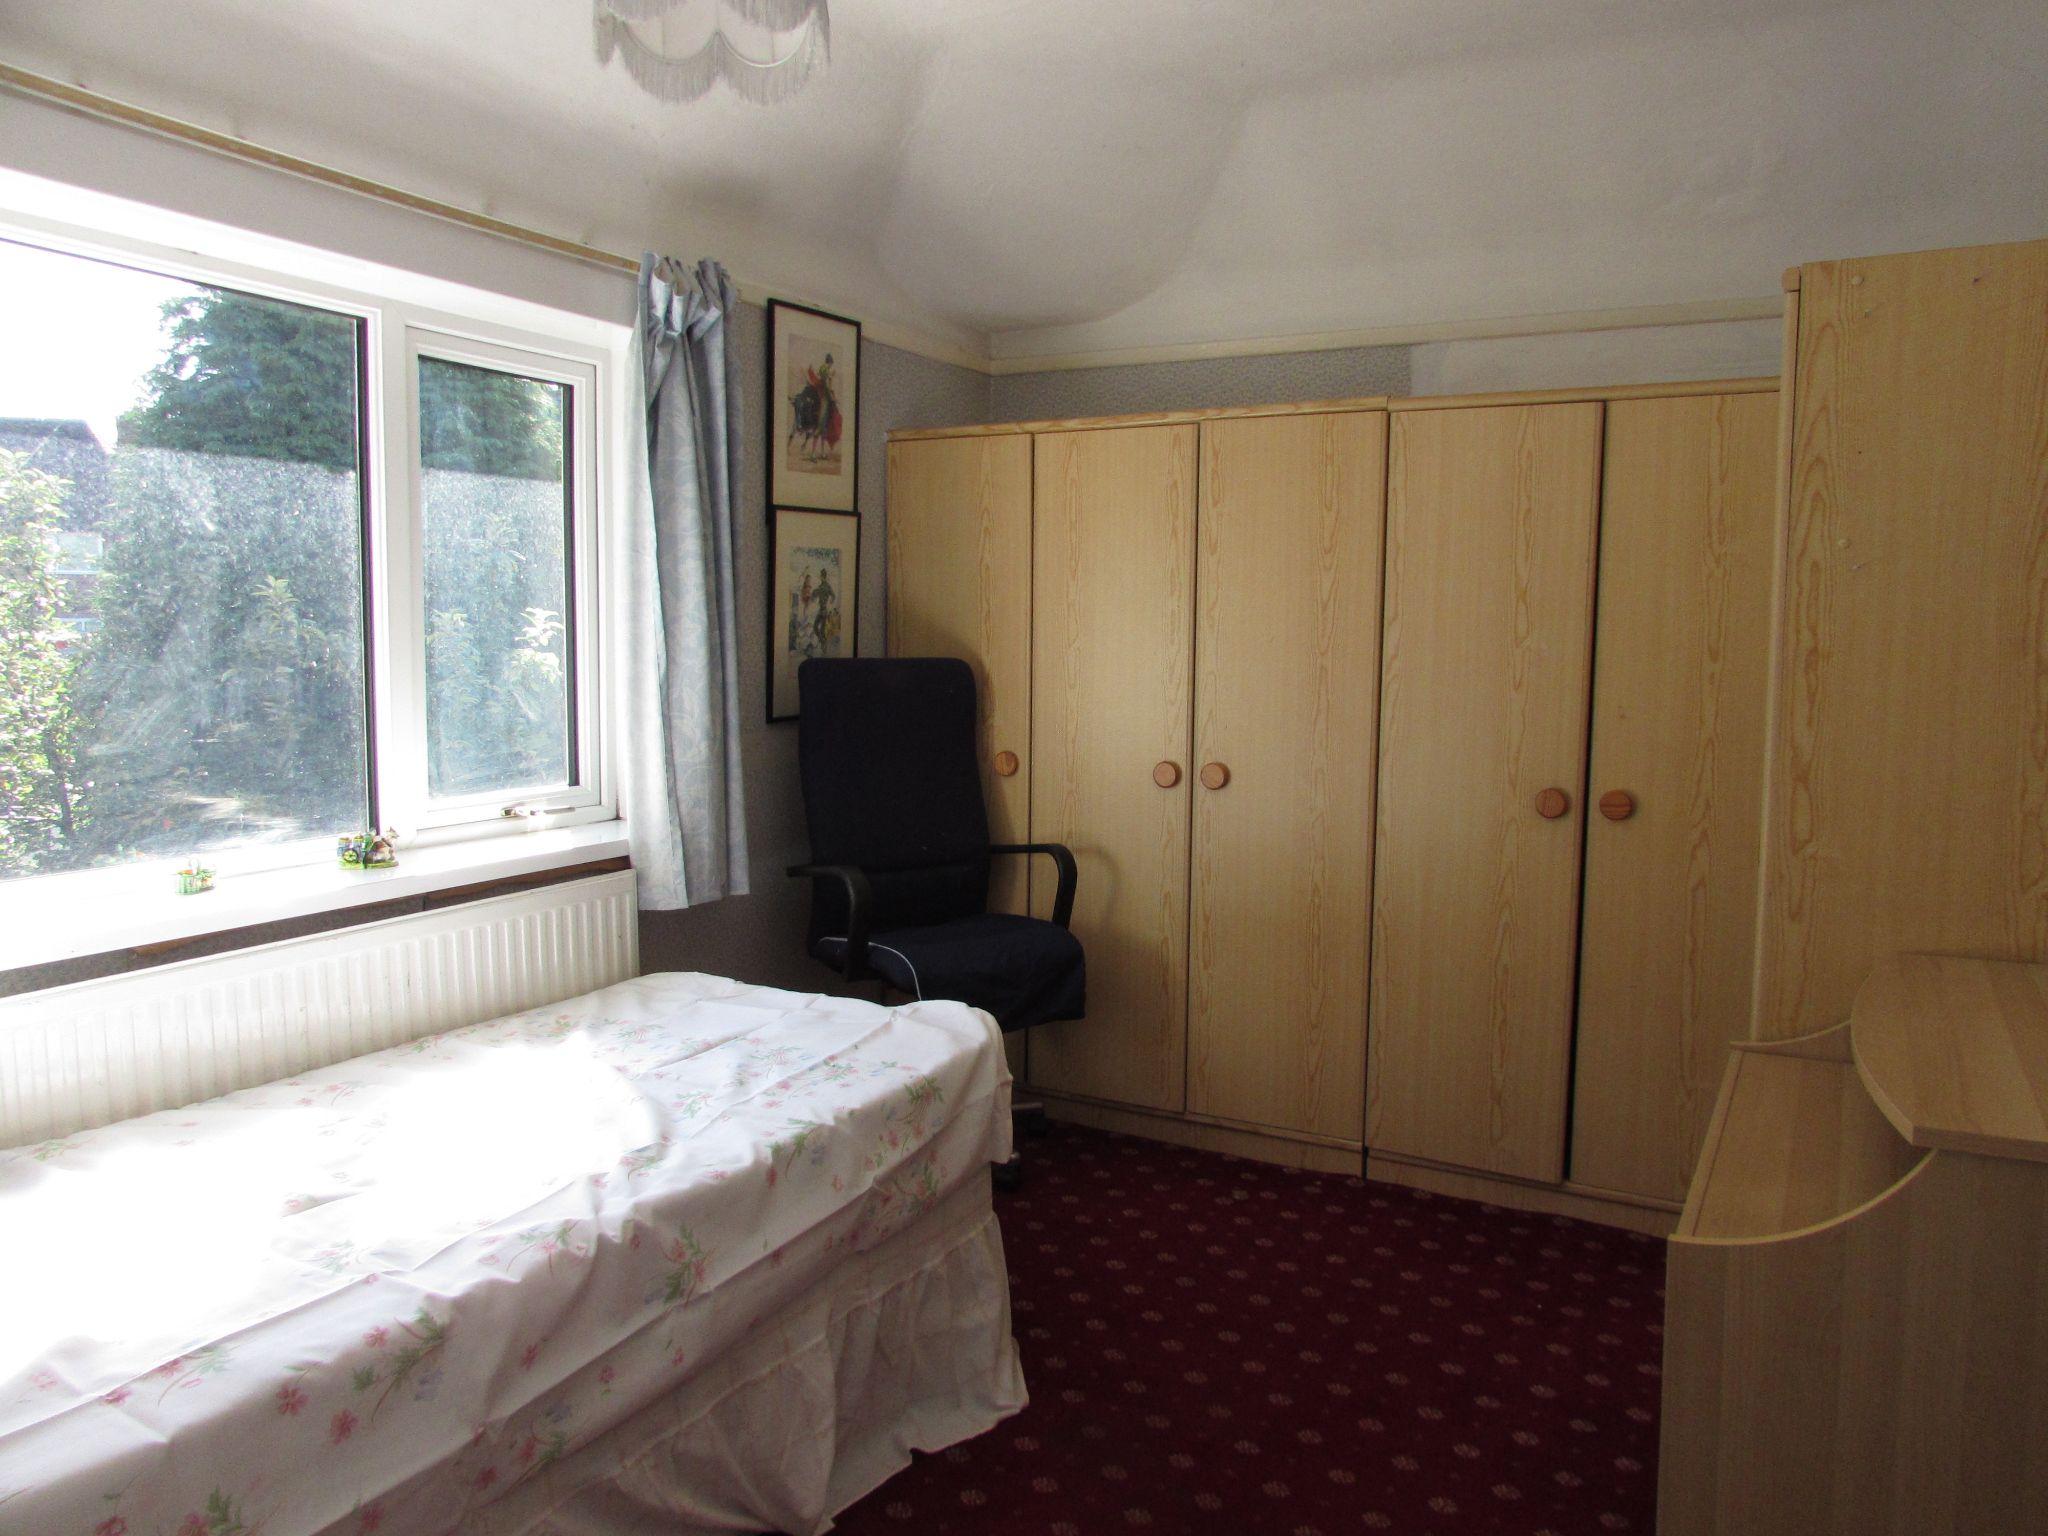 3 Bedroom Semi-detached House For Sale - Bedroom 2